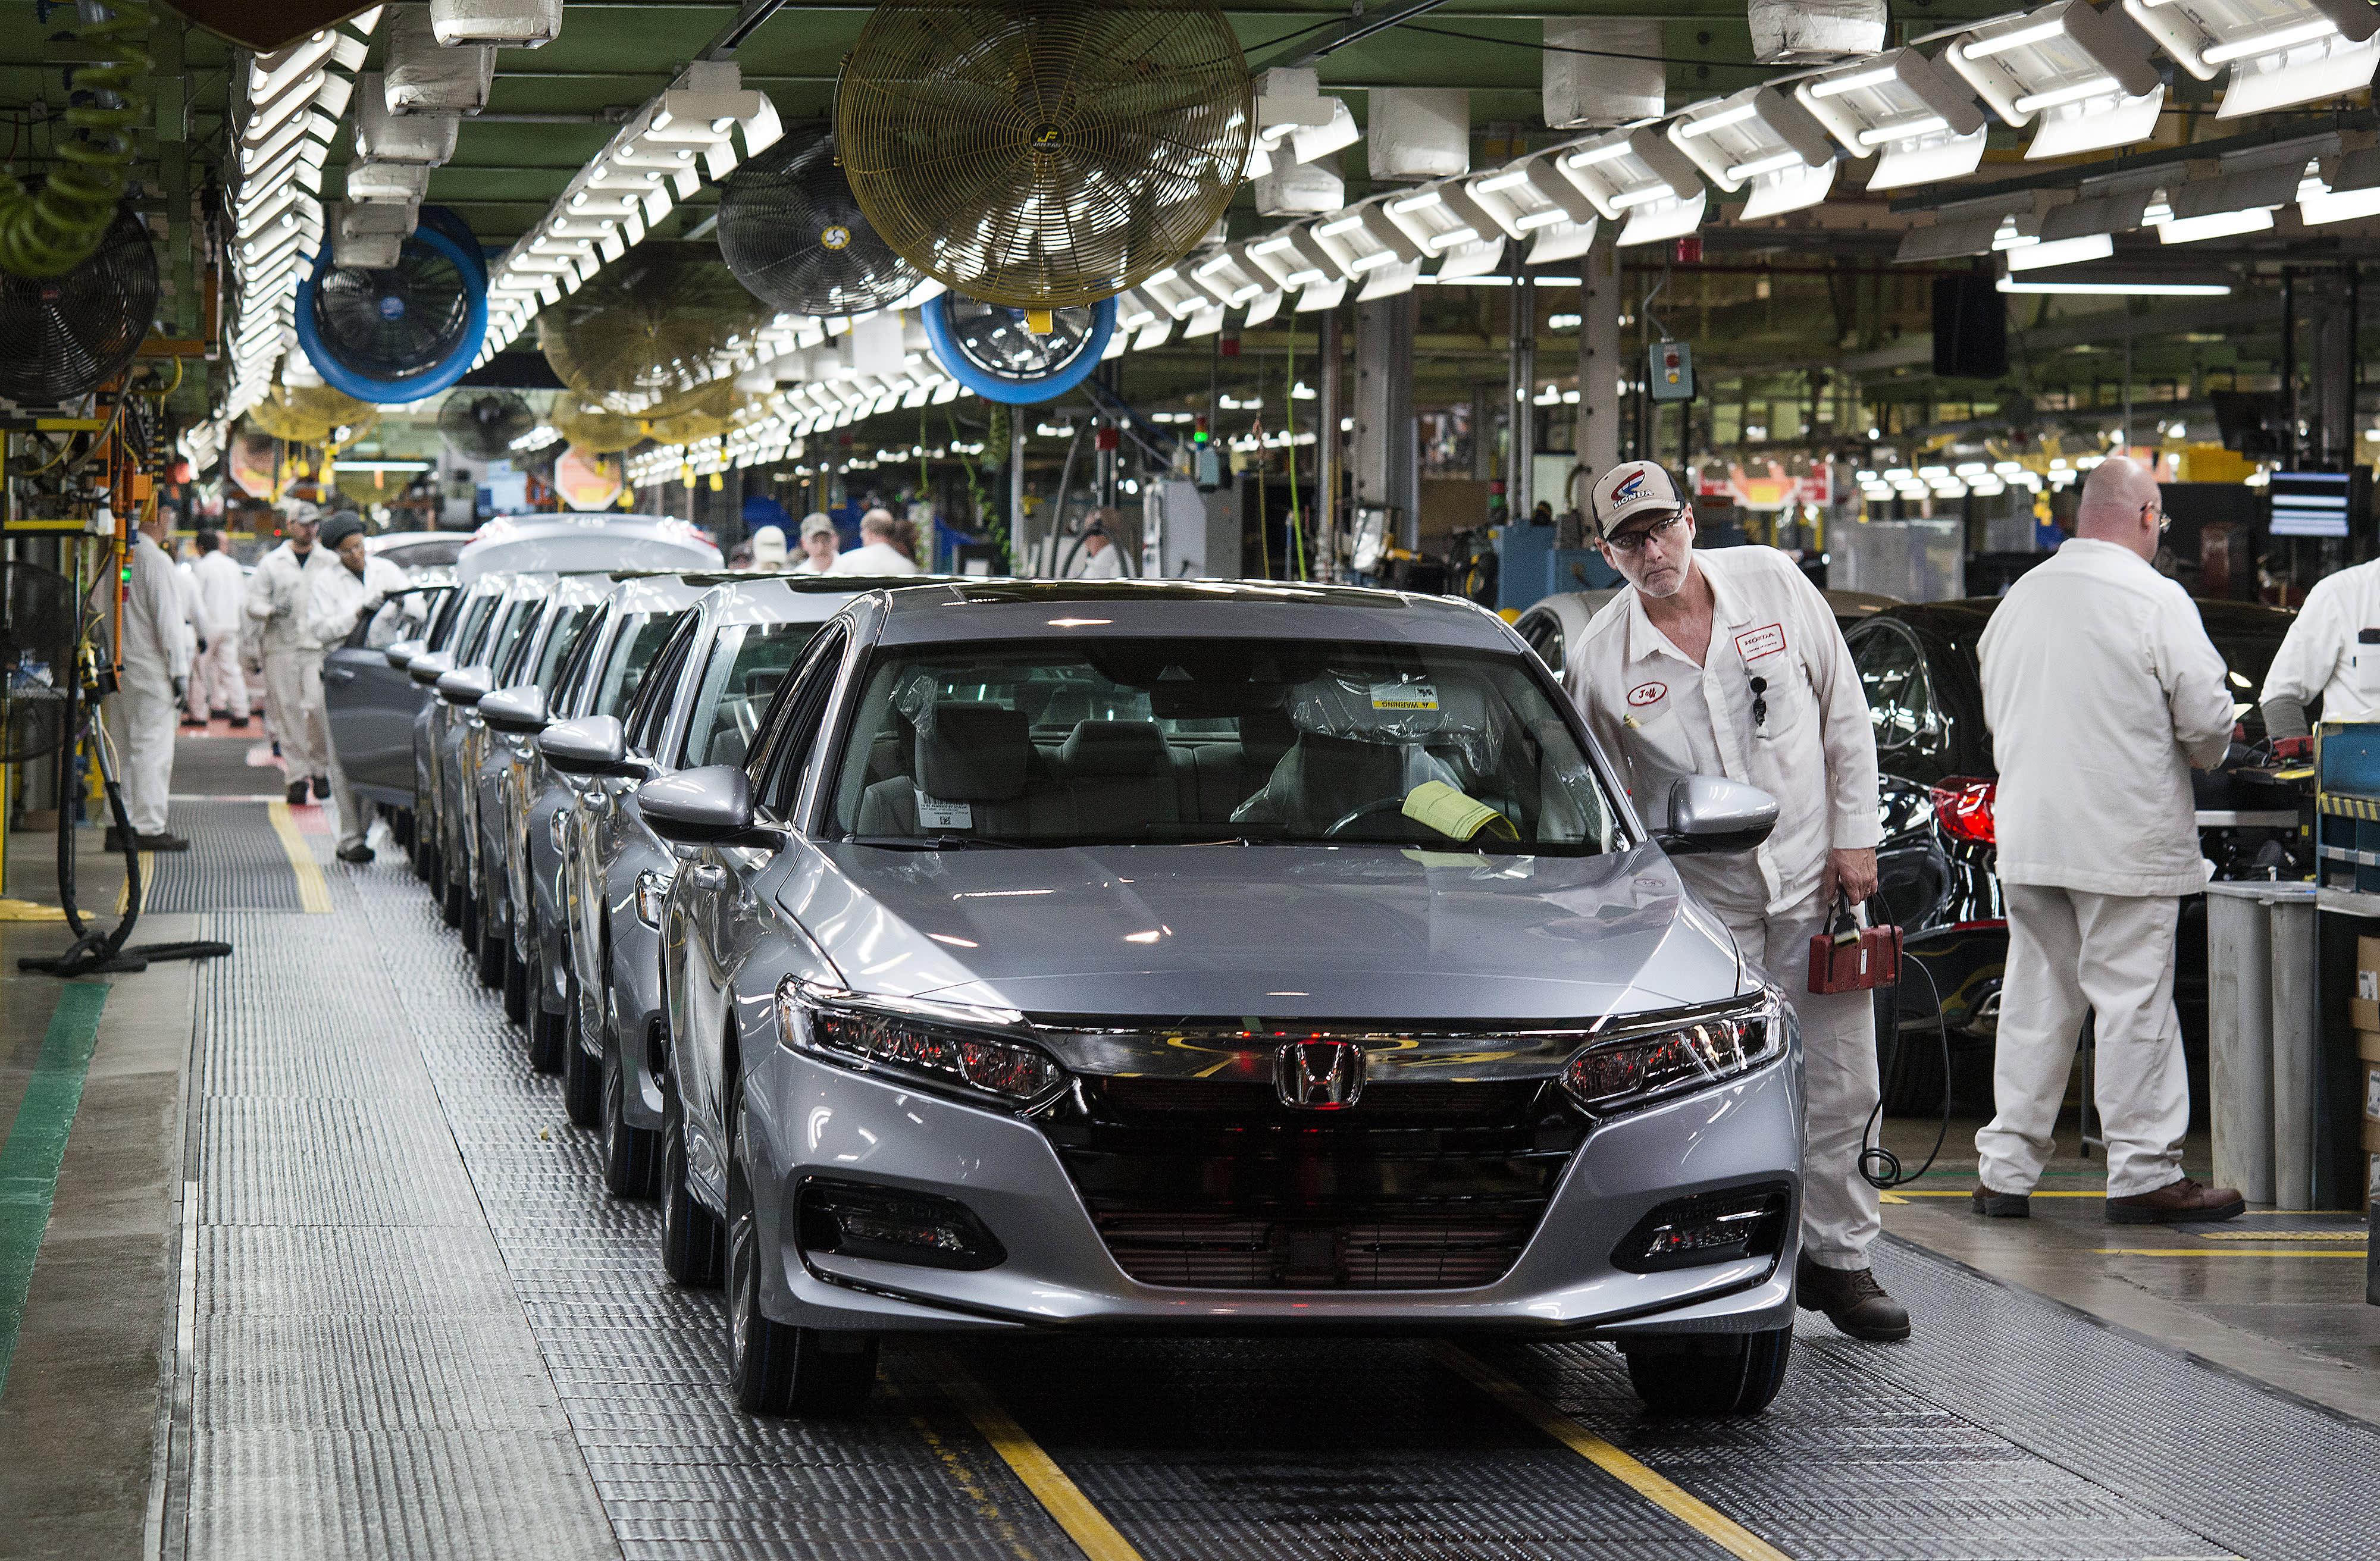 Honda North America shuts down U.S. plants due to outbreak